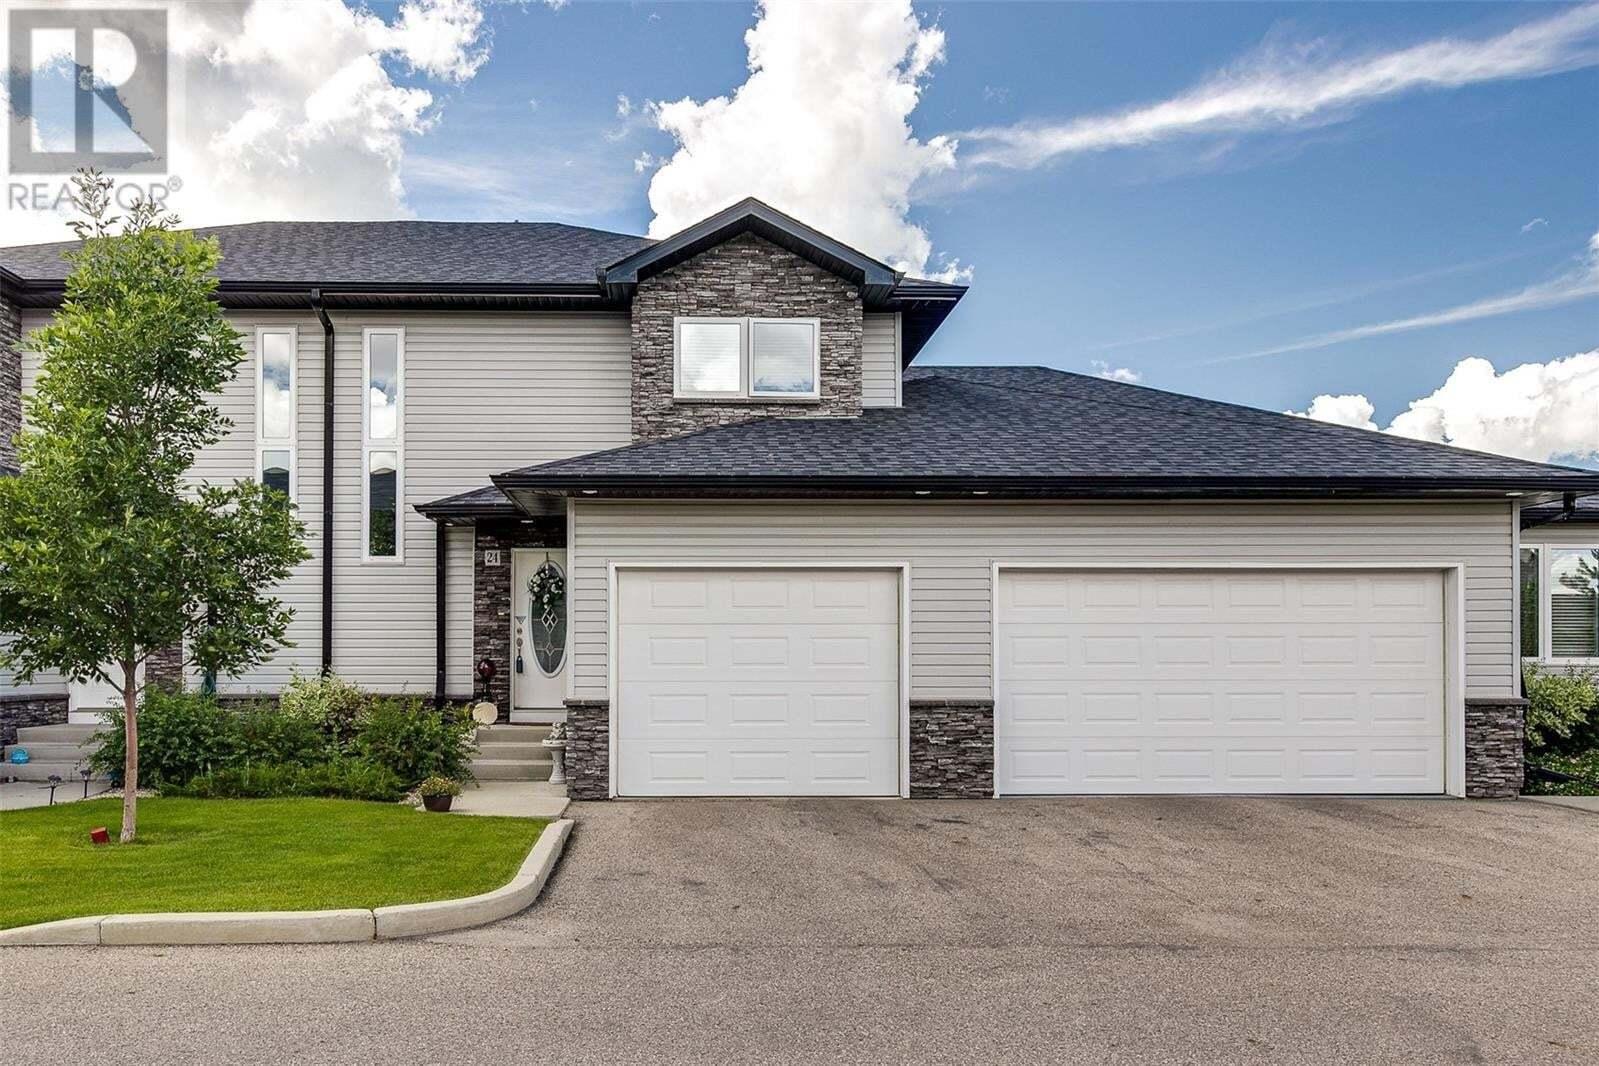 Townhouse for sale at 547 East Hampton Blvd Unit 24 Saskatoon Saskatchewan - MLS: SK817964